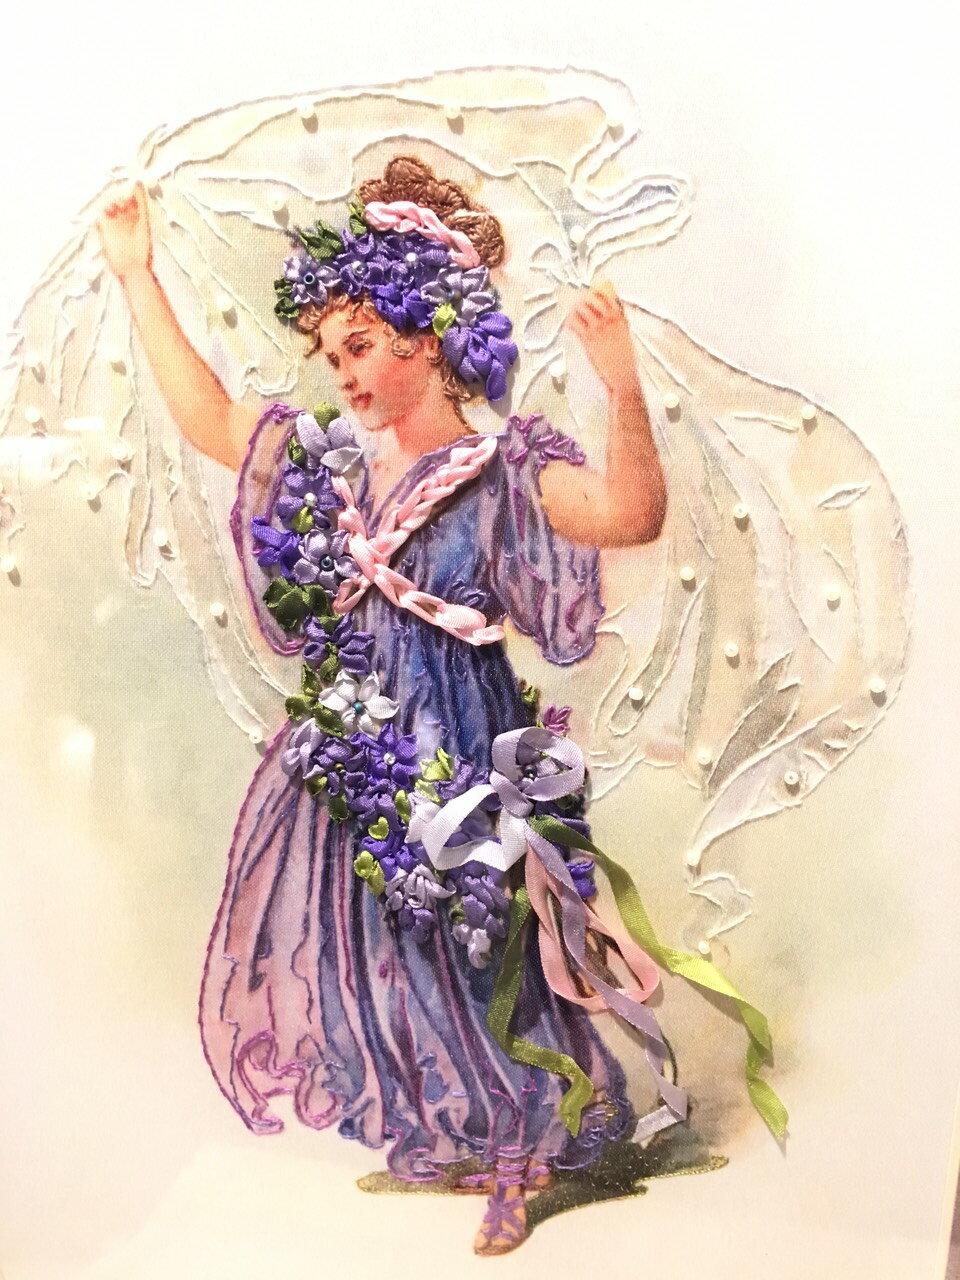 Petals緞帶刺繡盒裝 - 1083羅紋帶全彩16色 3